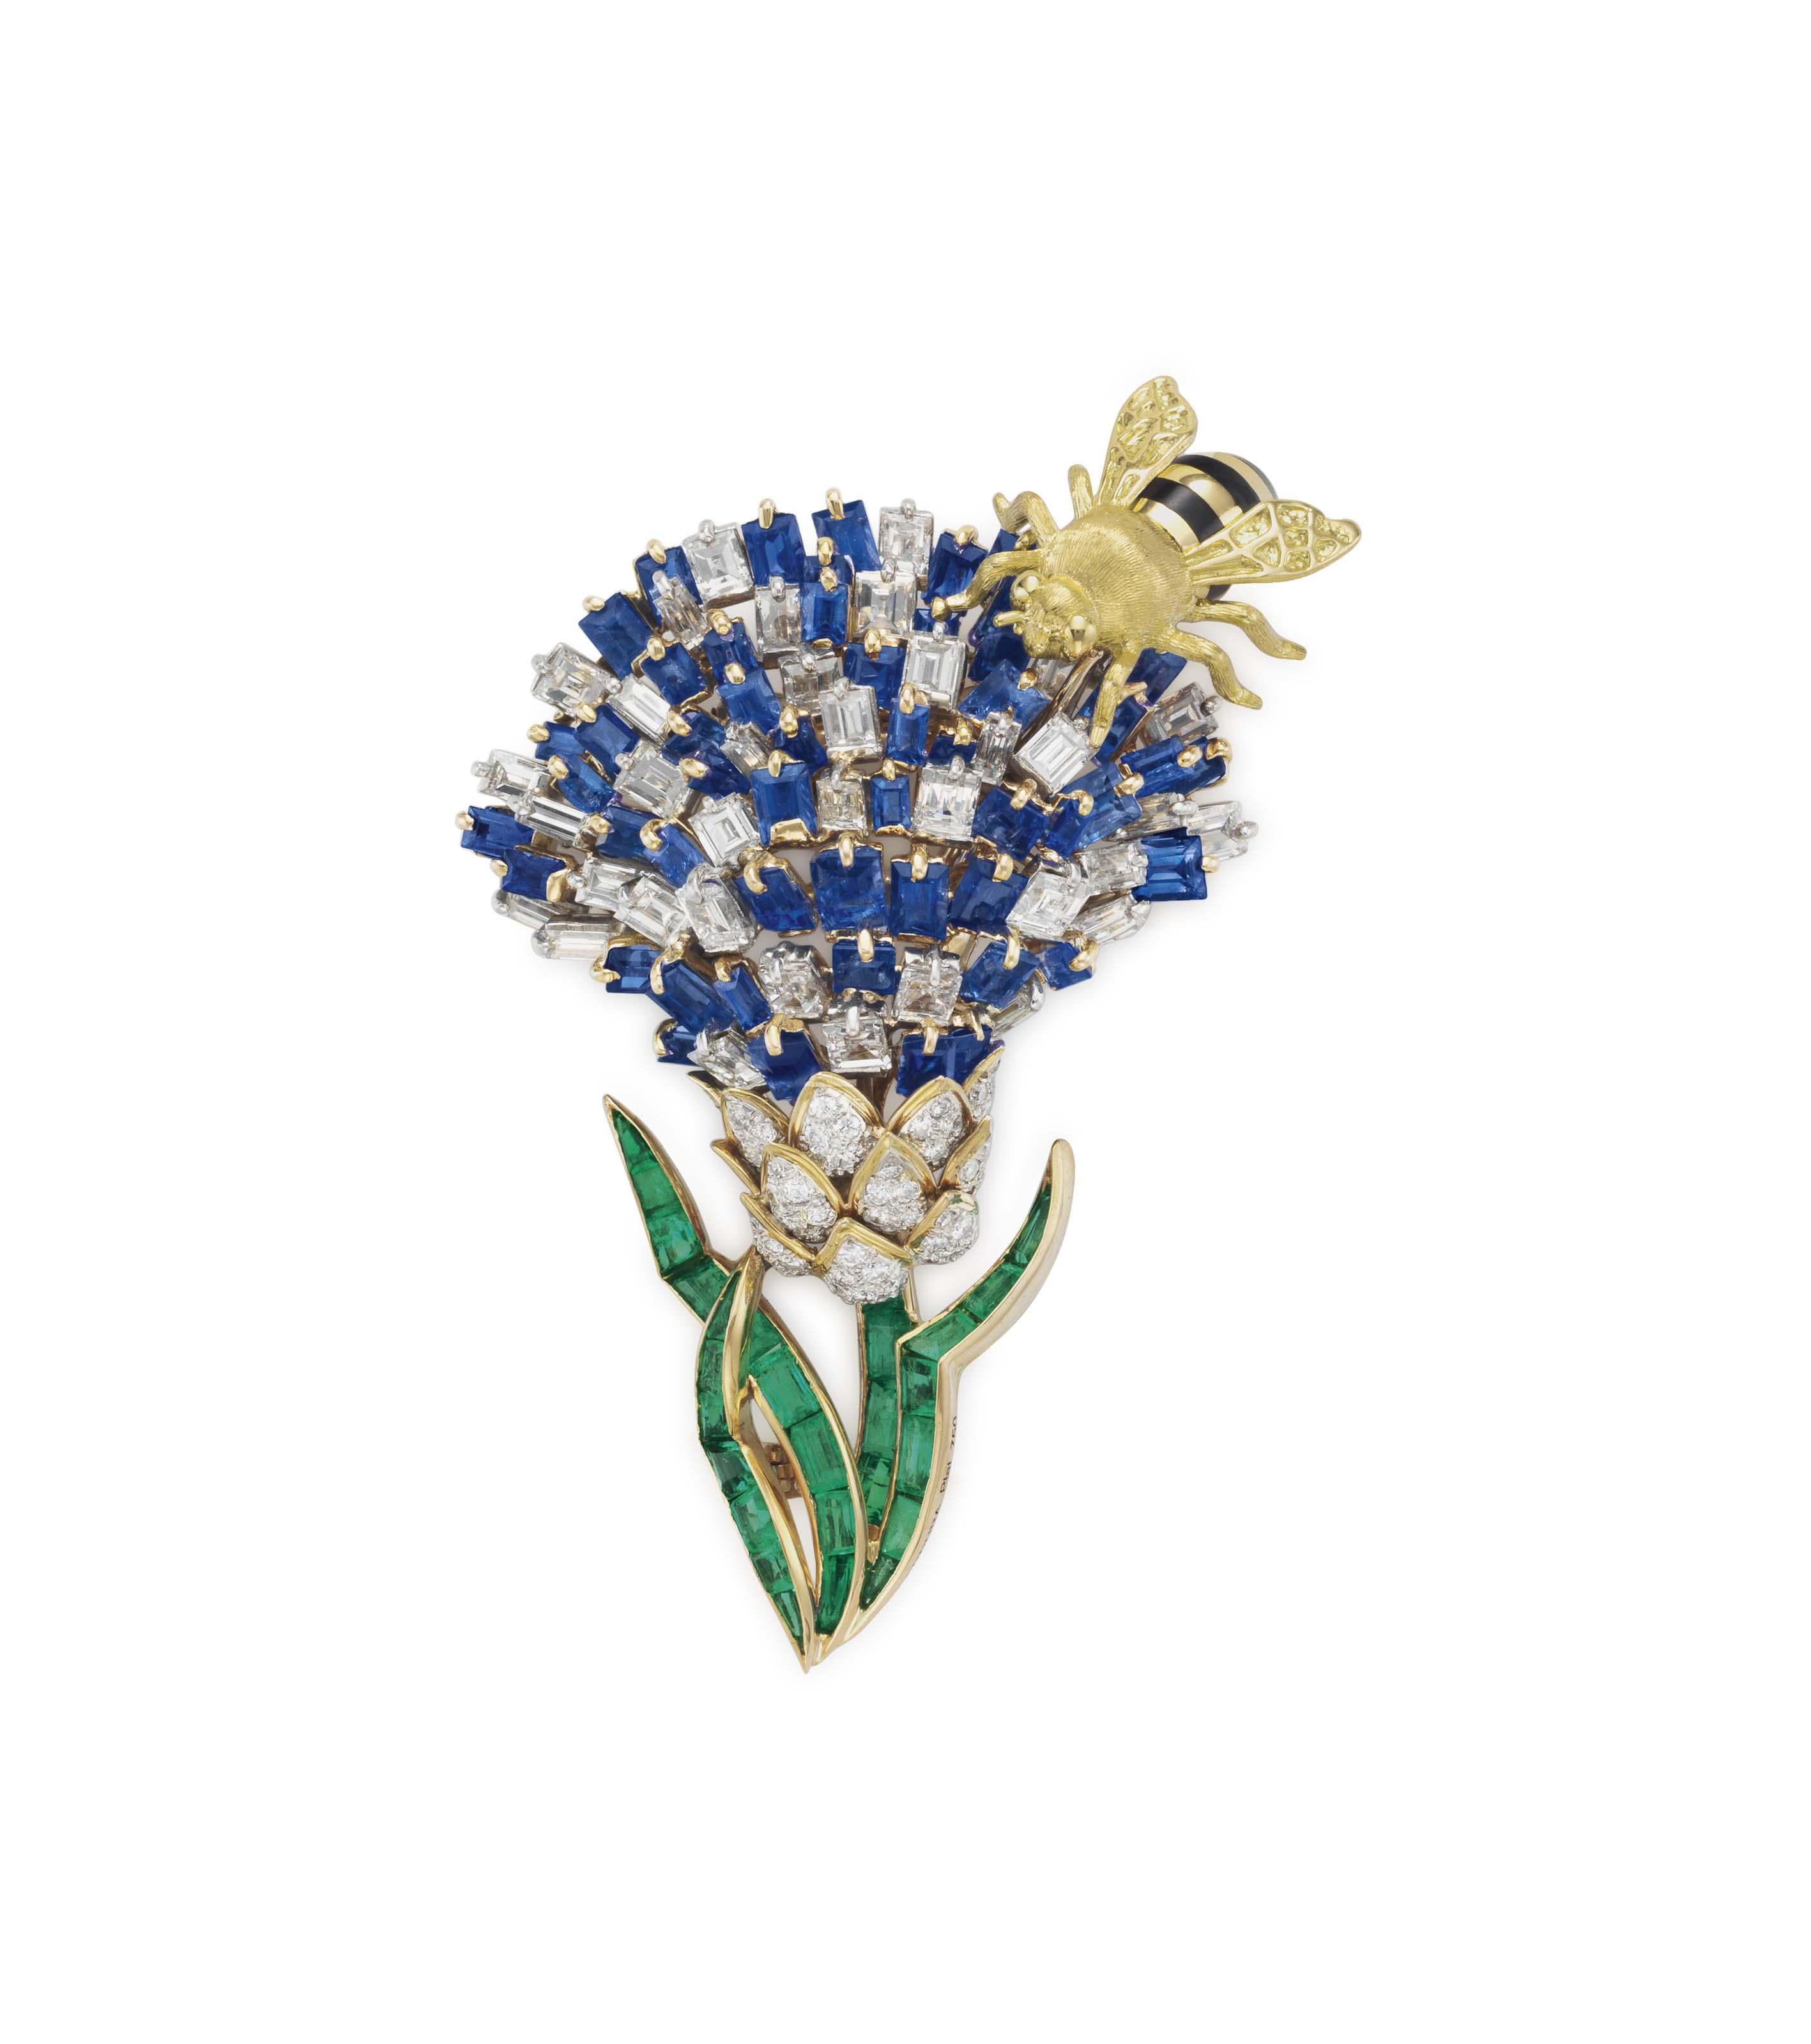 A DIAMOND, SAPPHIRE AND EMERALD 'THISTLE' BROOCH, BY VERDURA